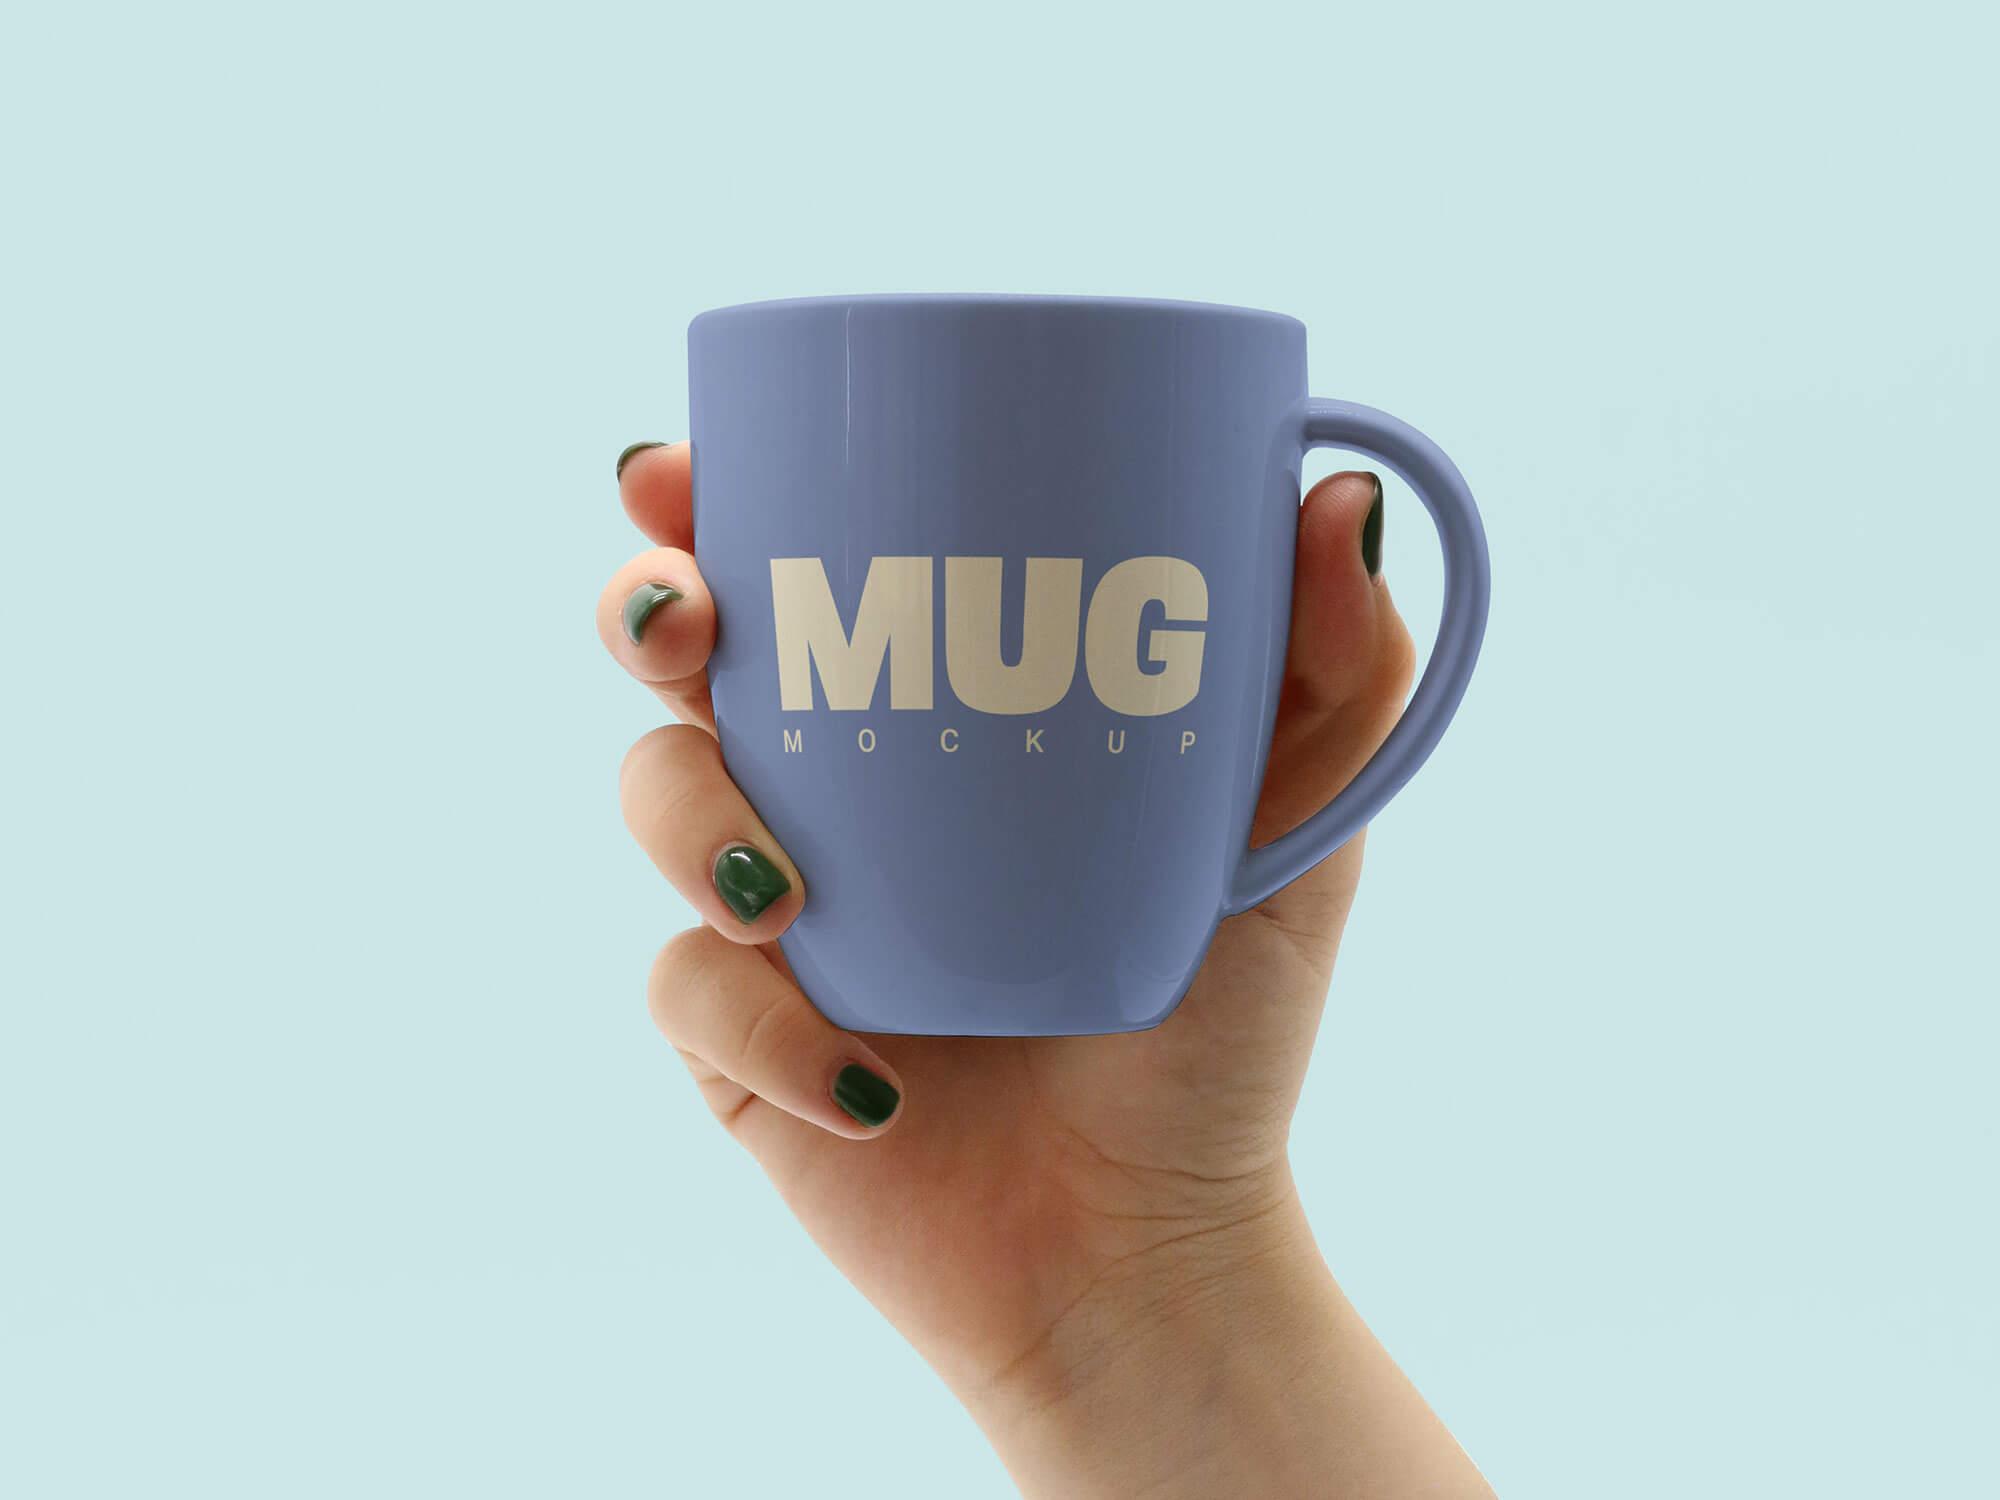 Free-Hand-Holding-Mug-Mockup-PSD-File